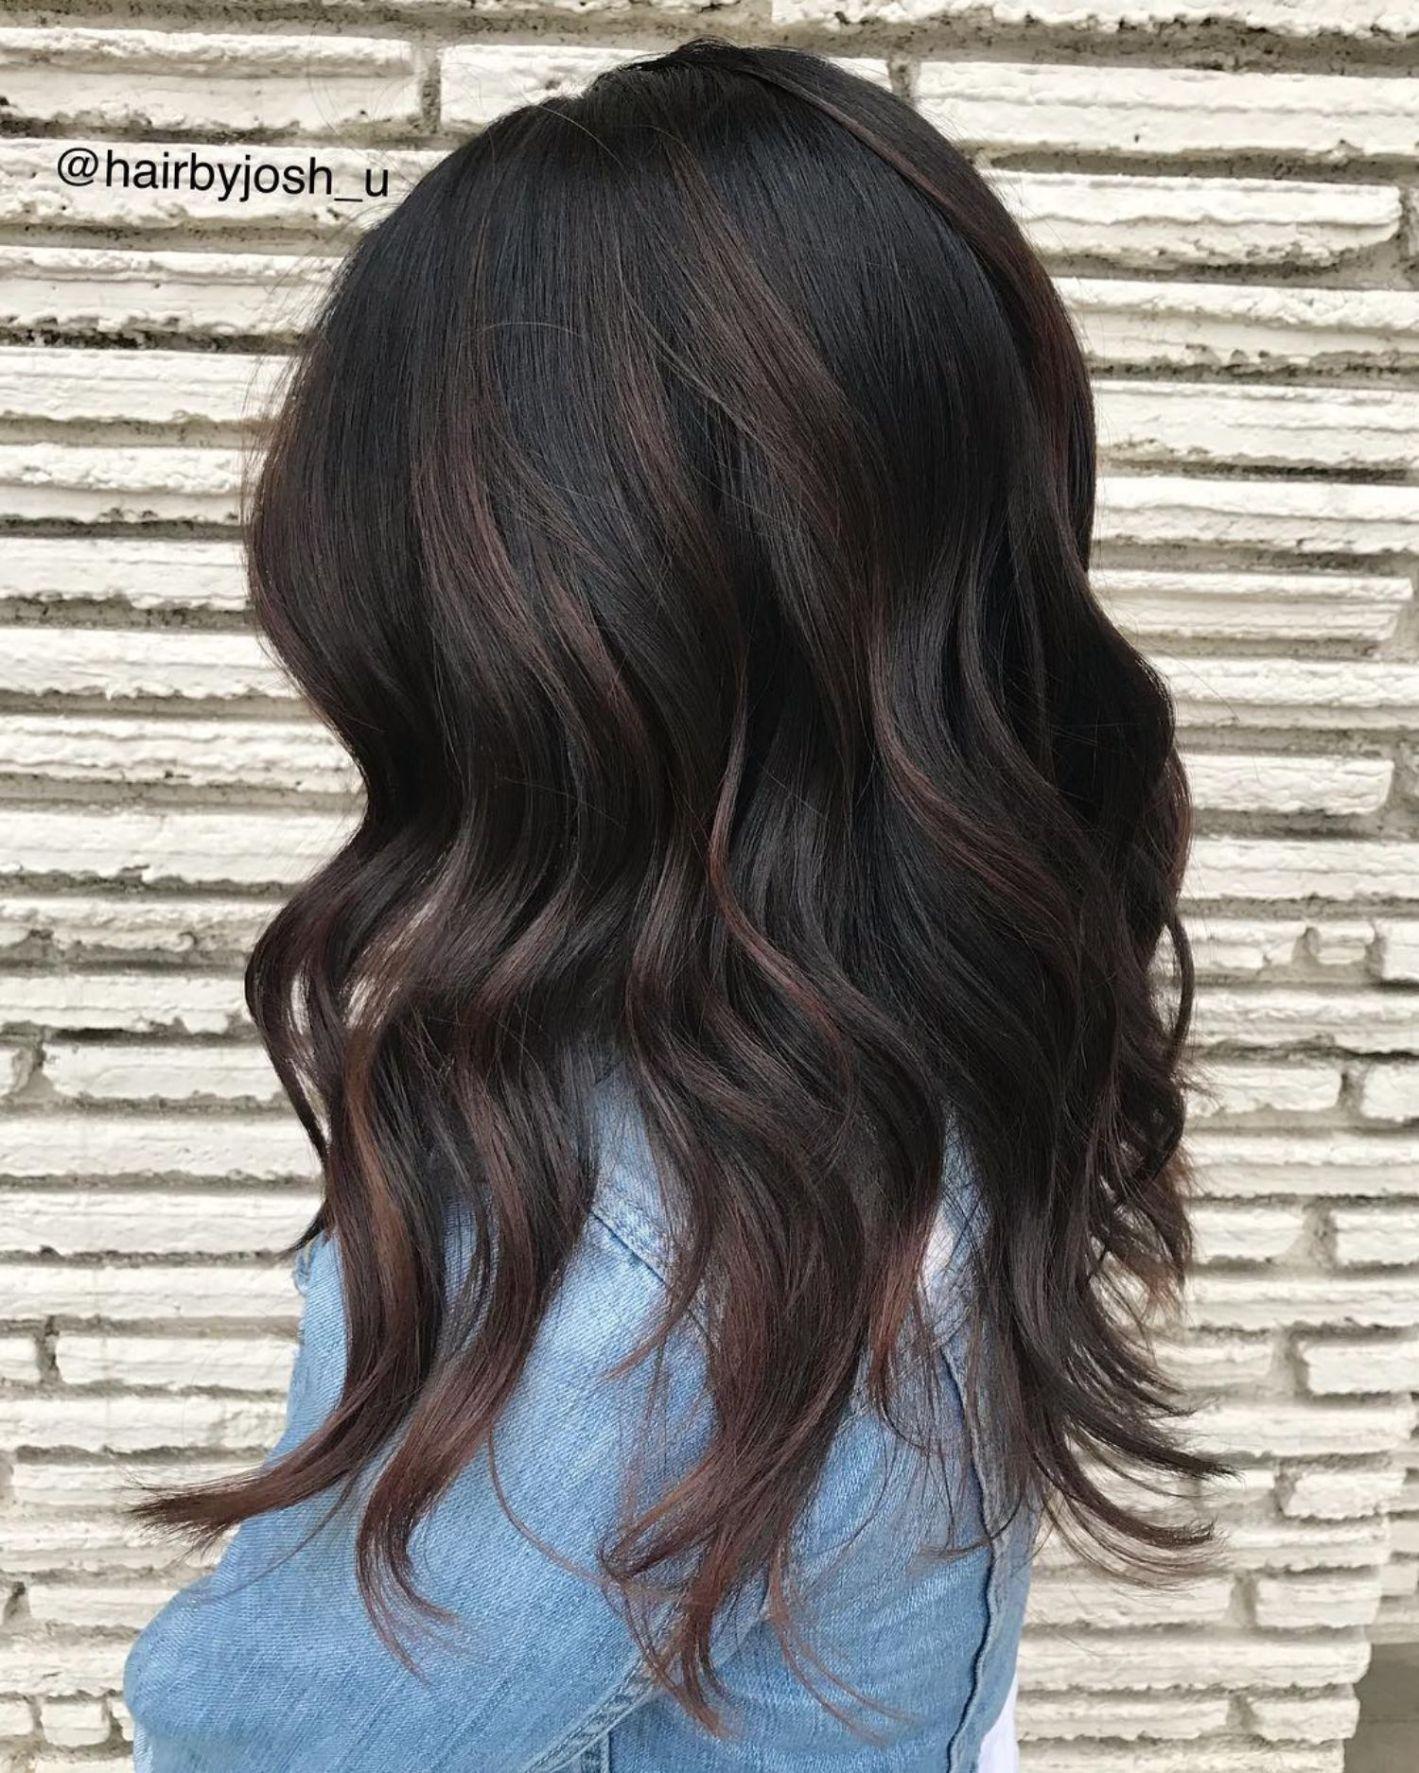 60 Chocolate Brown Hair Color Ideas for Brunettes #fallhaircolors #49: Black Hai…